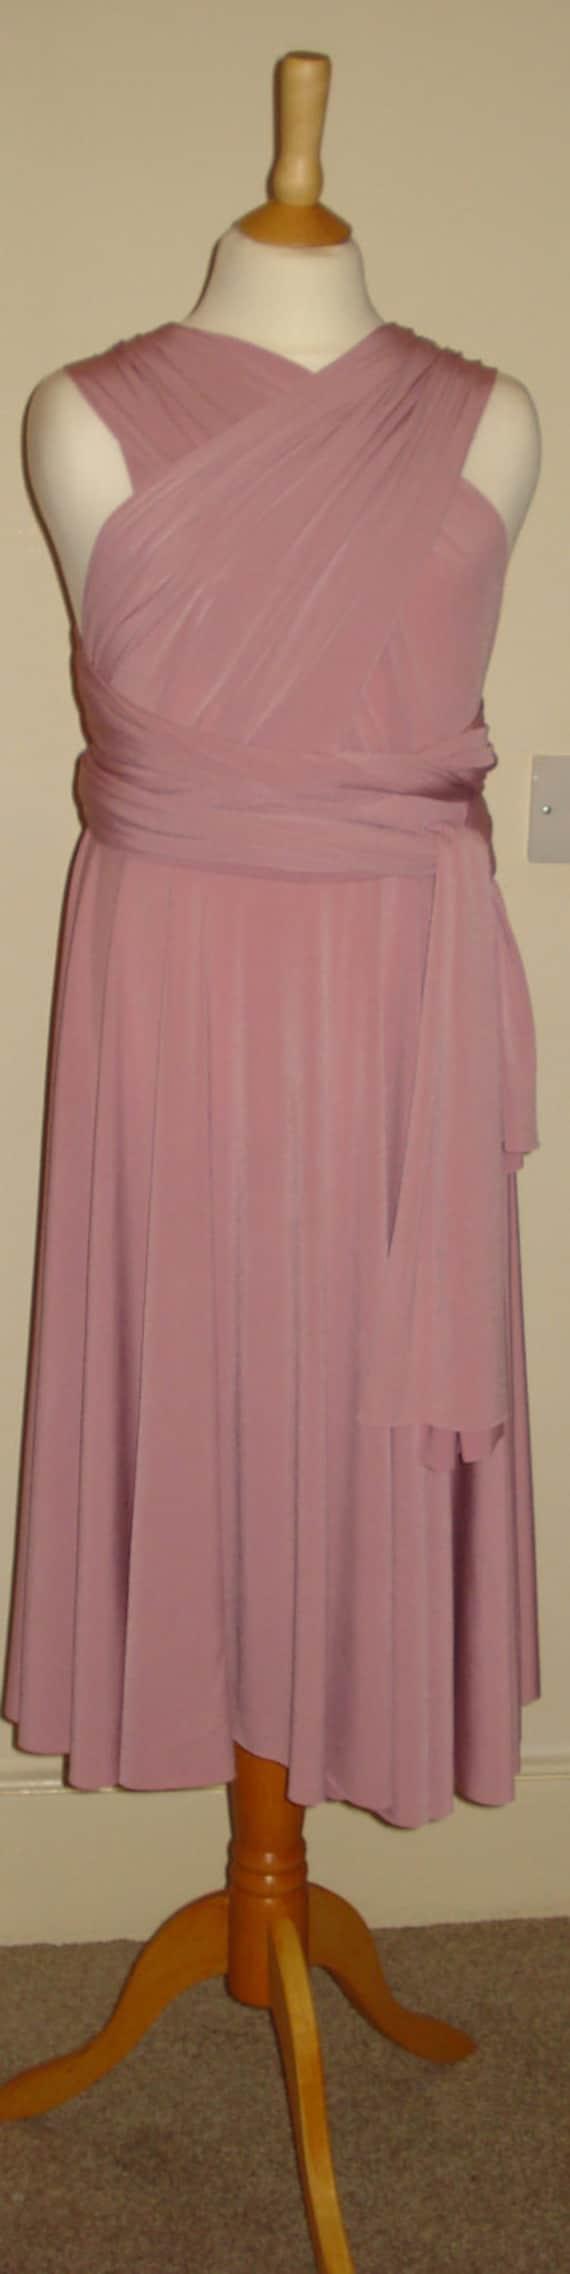 Dusky Pink Soft Touch Infinity Dress Flower Girl Dress